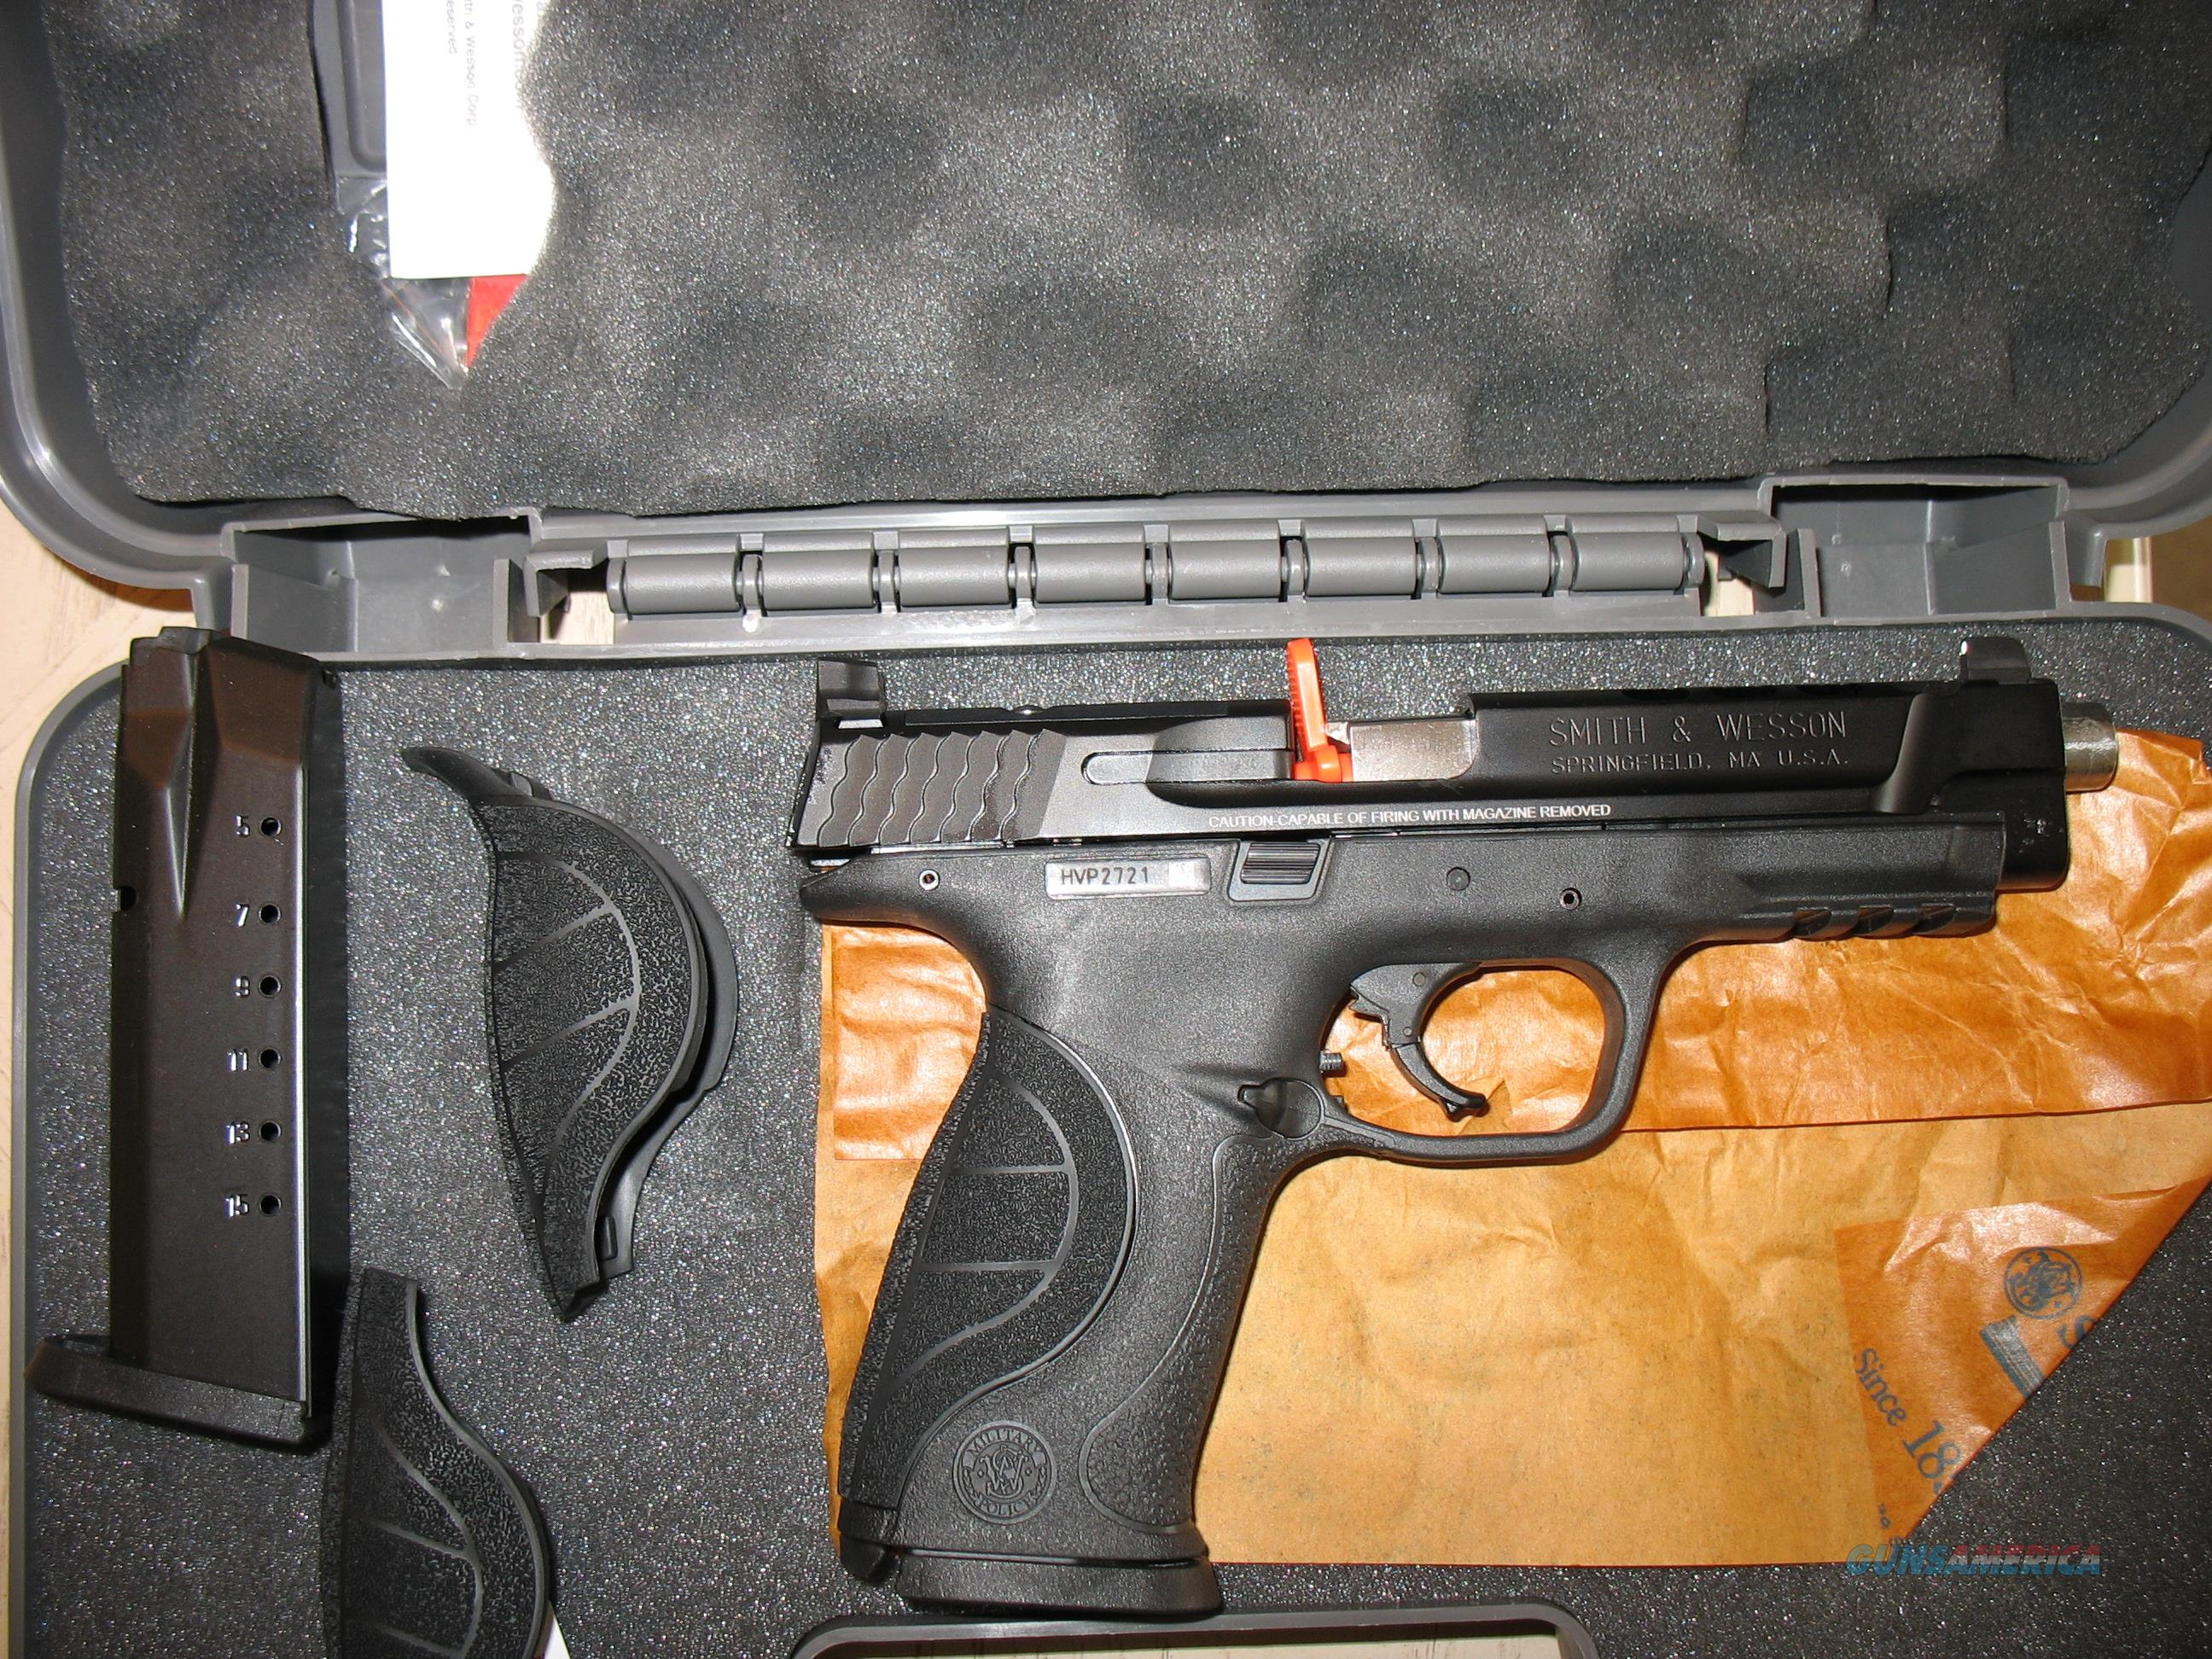 "Smith & Wesson (S&W) M&P Performance Center C.O.R.E. Ported .40L, 5"", 4 Mags  Guns > Pistols > Smith & Wesson Pistols - Autos > Polymer Frame"